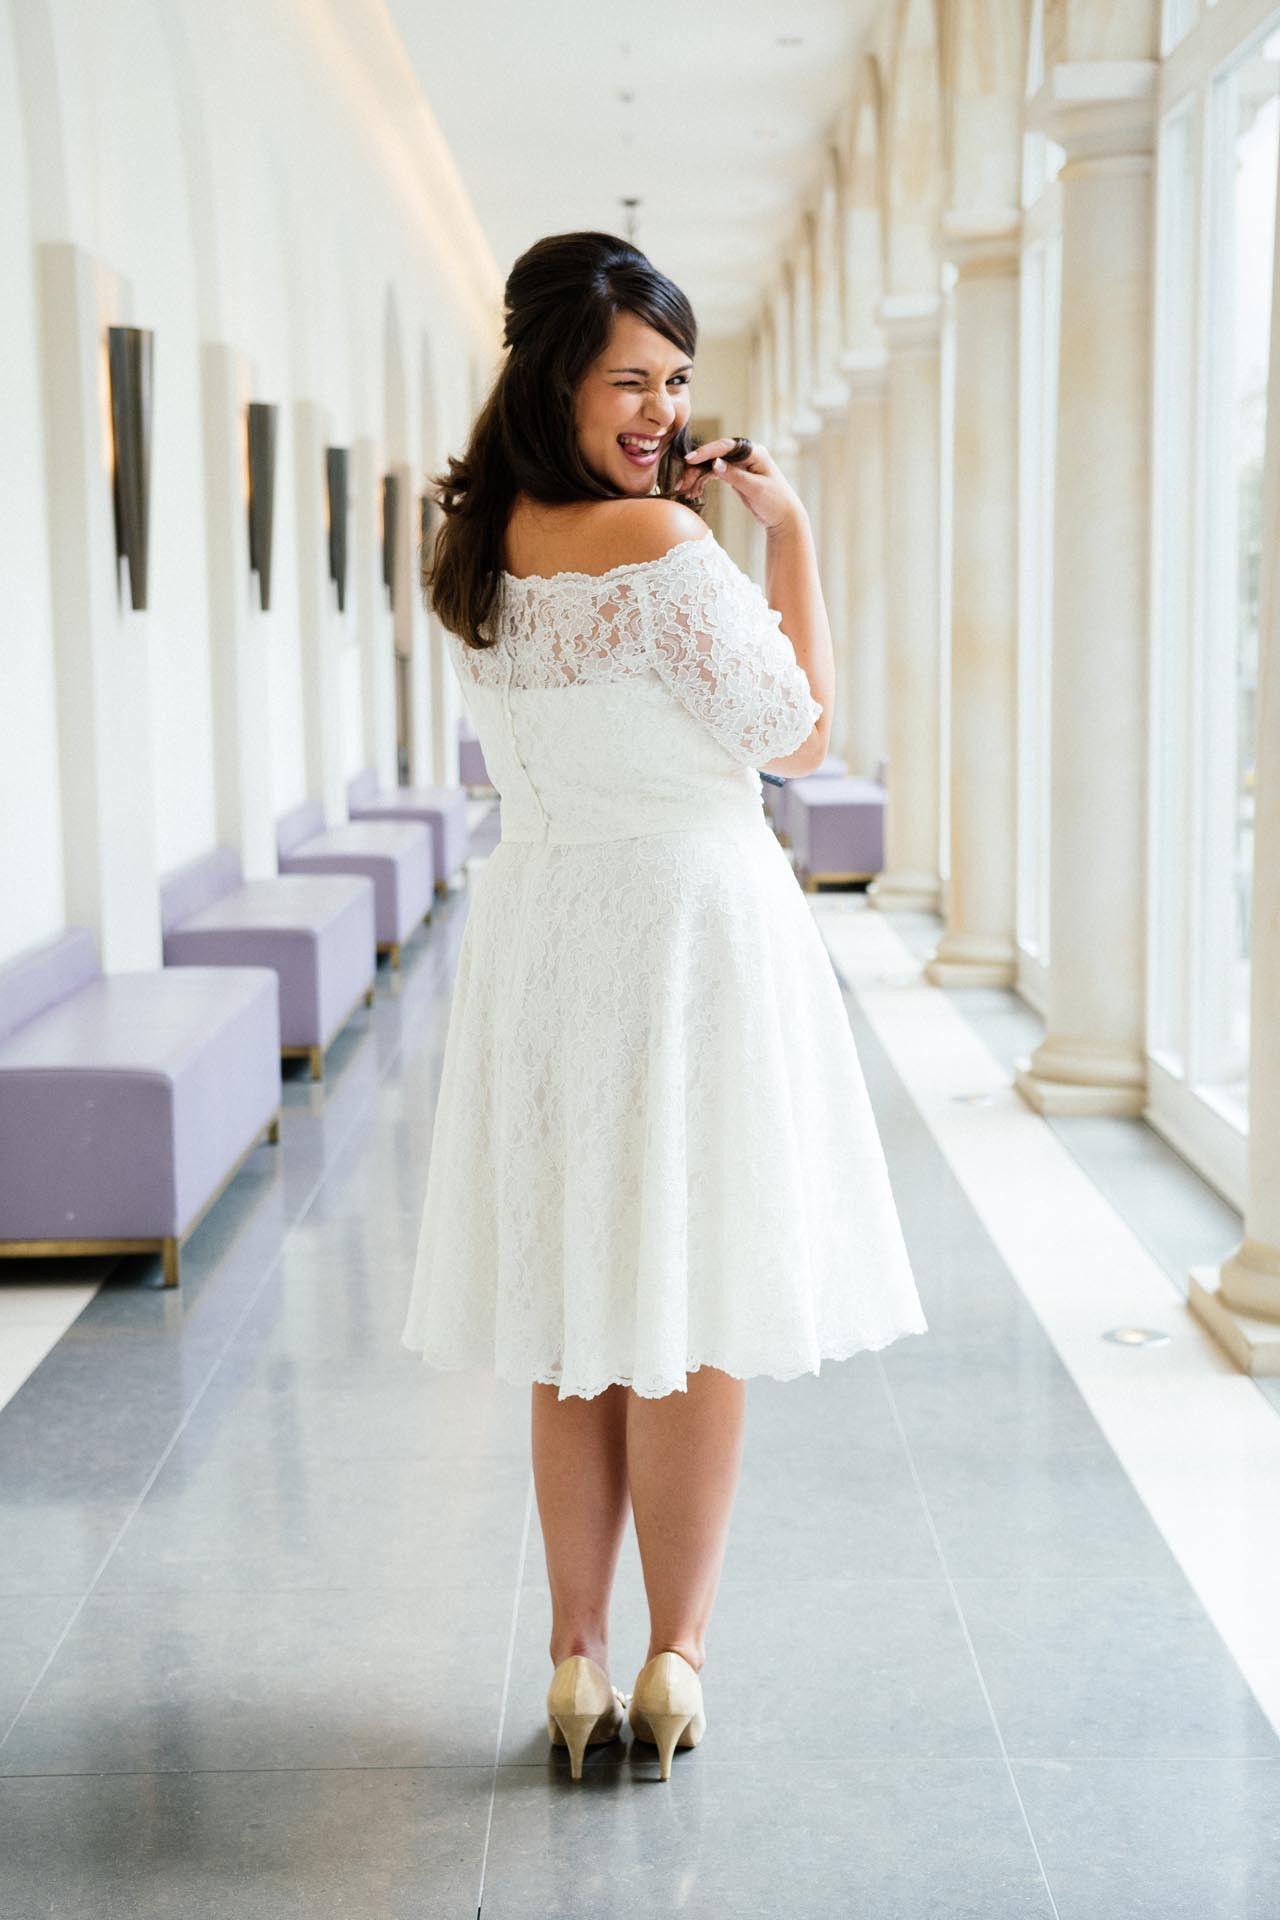 Brautkleider Grosse Grossen Inspirational Brautkleider Grosse Grossen Moderne Hochzeitskleider In 48 Braut Hochzeitskleid Modern Brautkleid Kurz